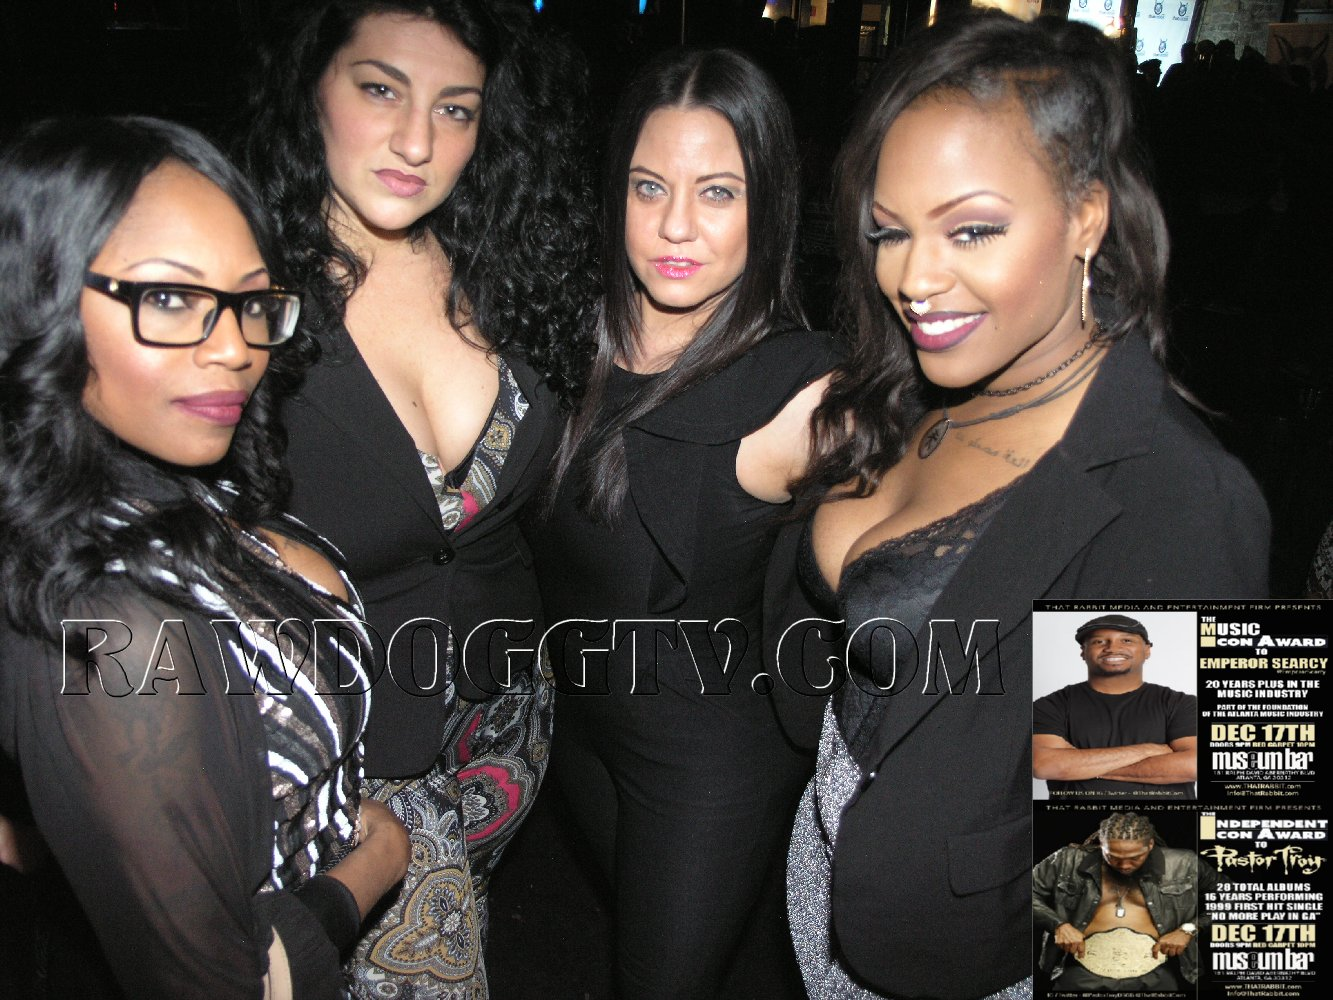 ThatRabbit Magazine Photos-ATL Legends Reunion-The Music Icon Award-Museum Bar Atlanta-Ray Hamilton- dec 17 2015 RAWDOGGTV 305-490-2182 (129)